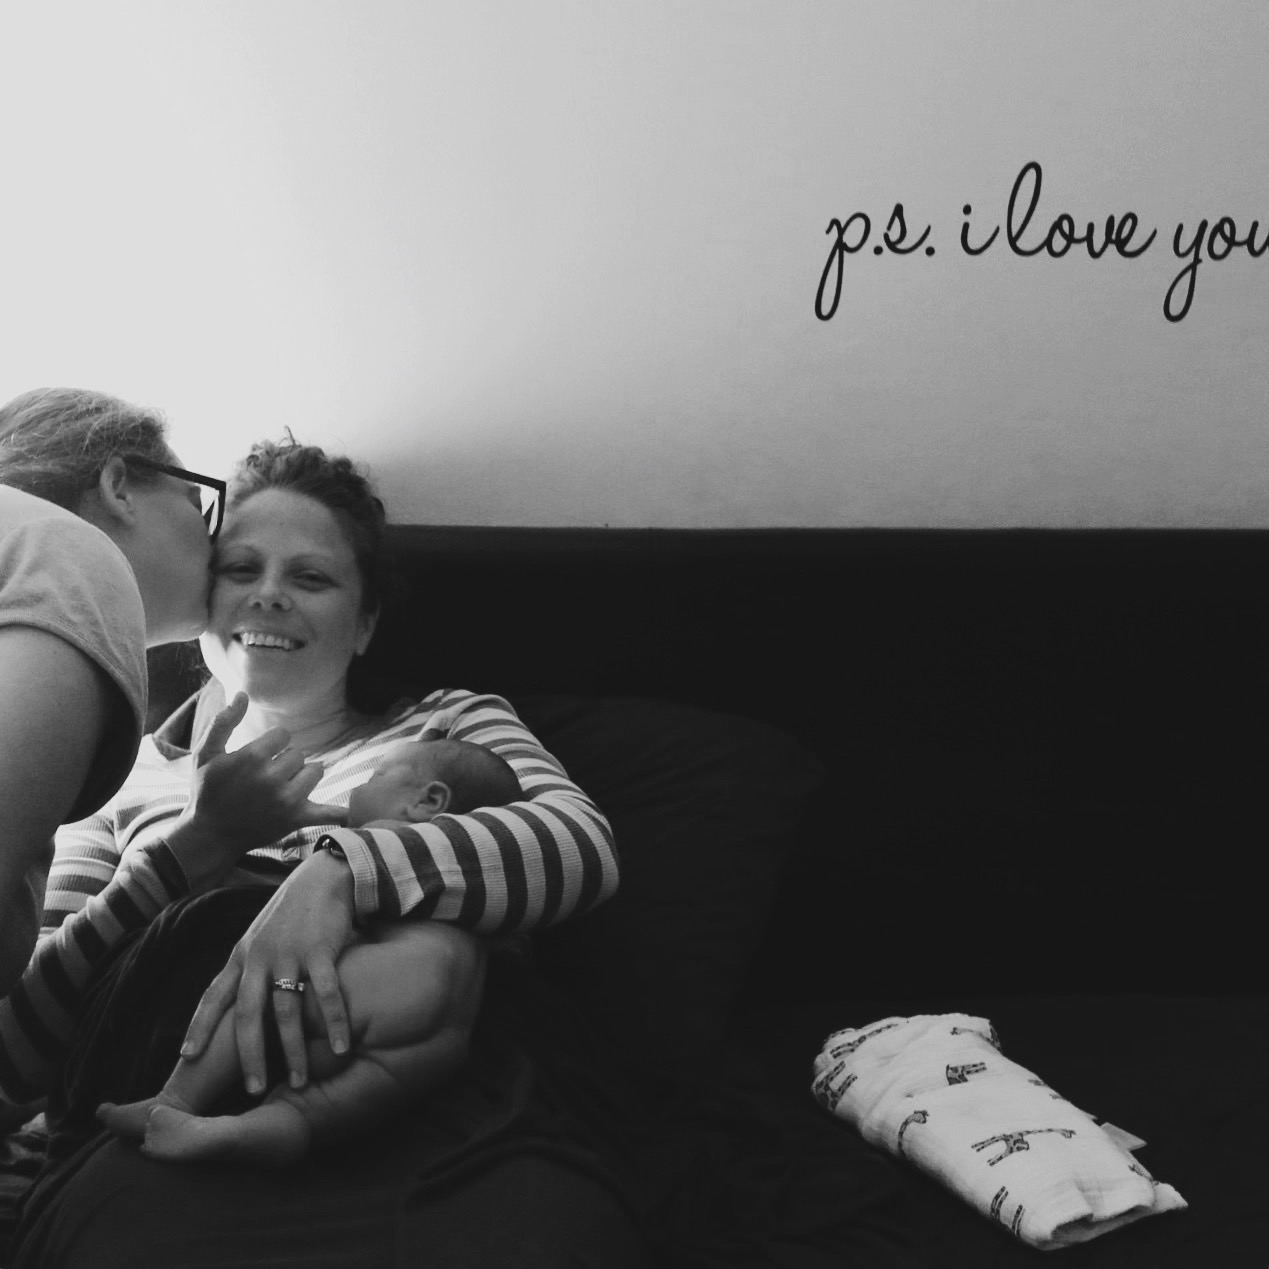 holly_sue_ps_i_love_you.jpg